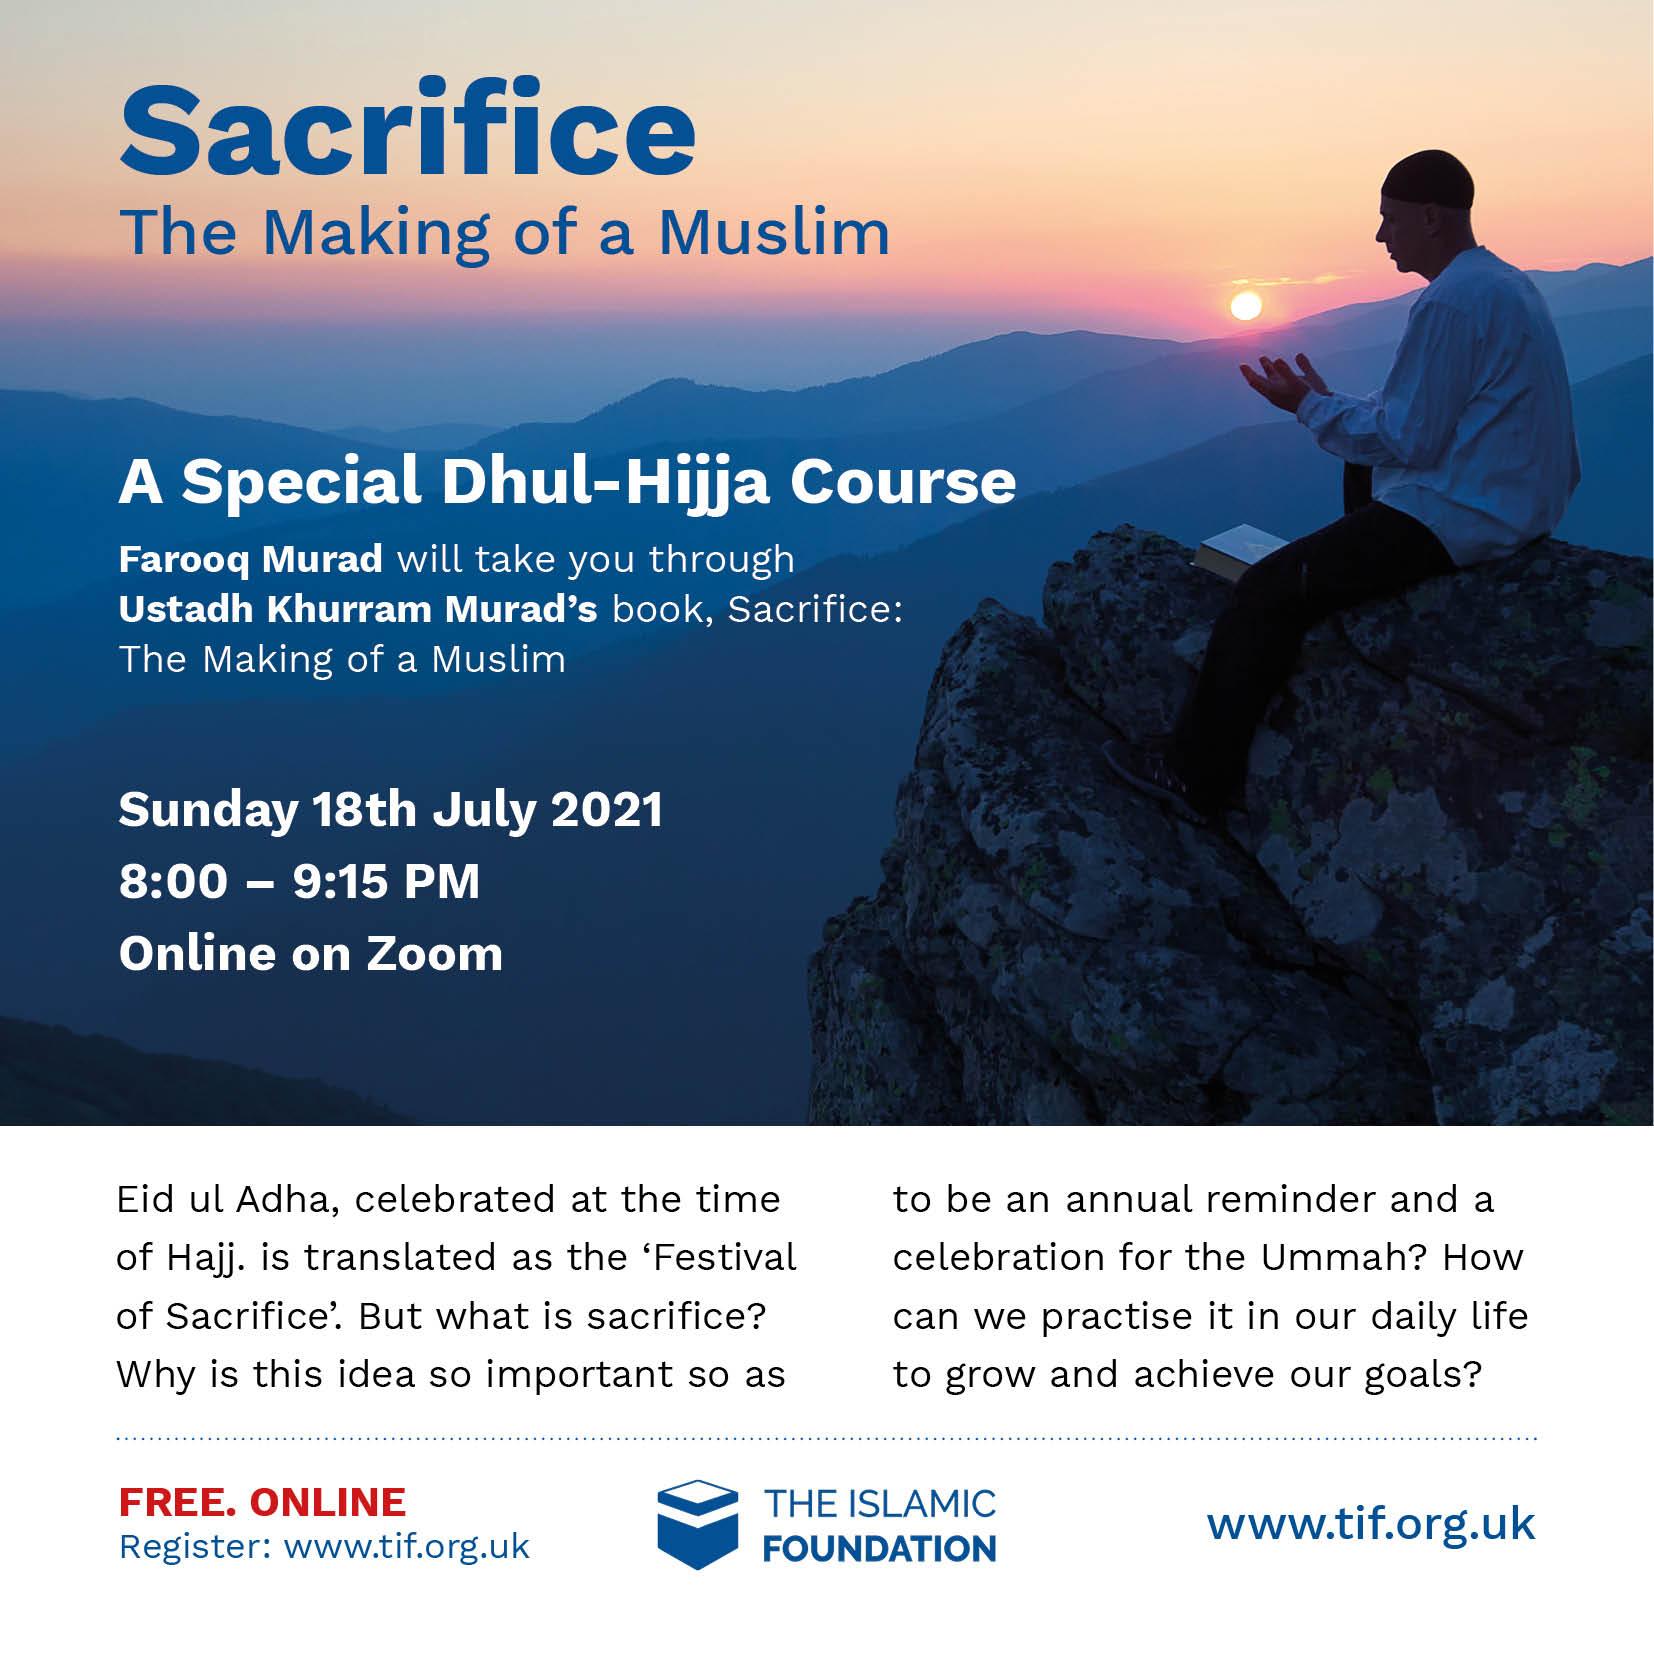 Sacrifice: The Making of a Muslim